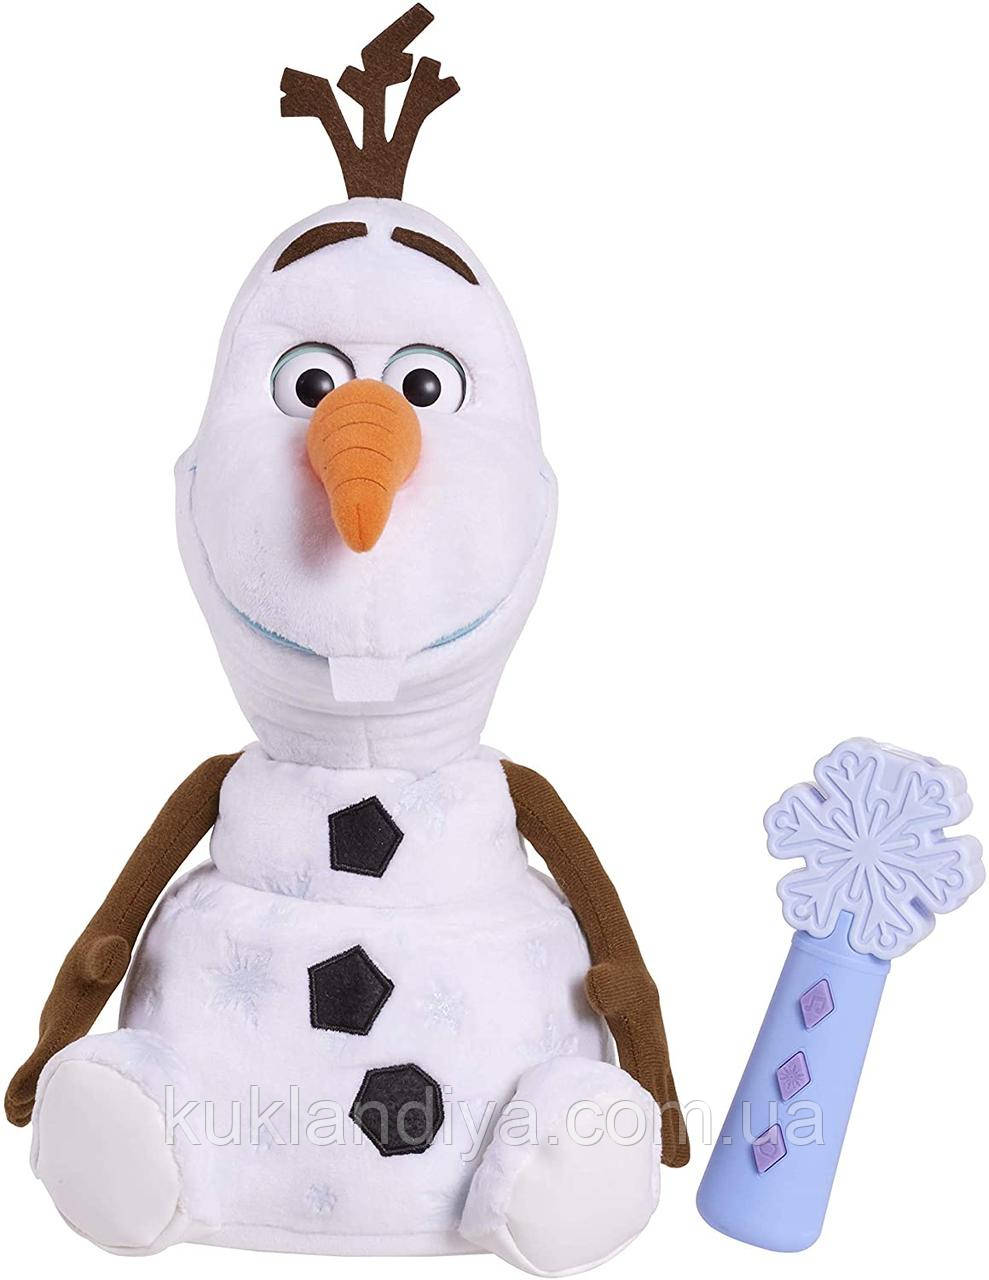 Disney Frozen 2 Follow-Me Friend интерактивный Снеговик Олаф 37 см